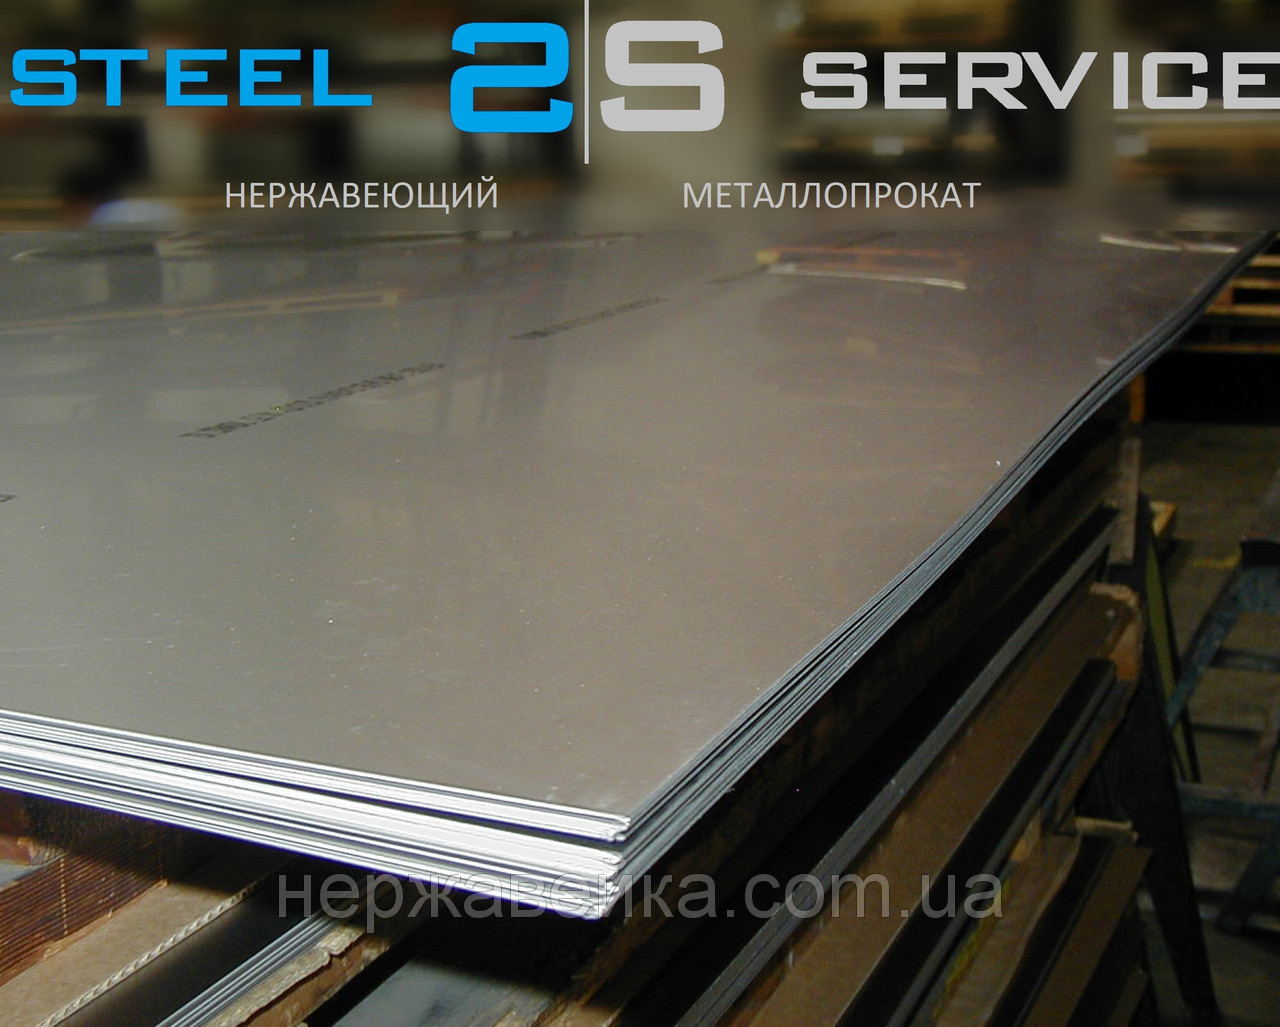 Нержавеющий лист 1х1000х2000мм AISI 430(12Х17) 2B - матовый, технический